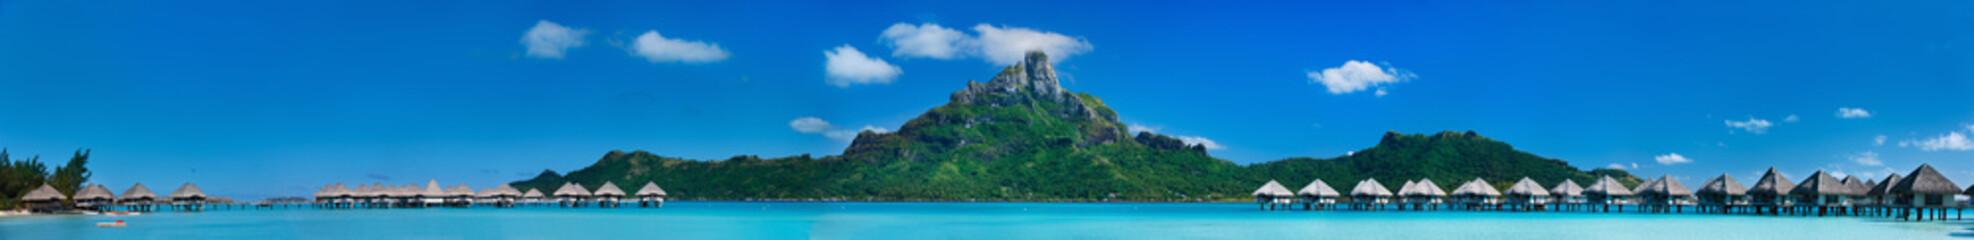 Fototapete - Bora Bora panorama